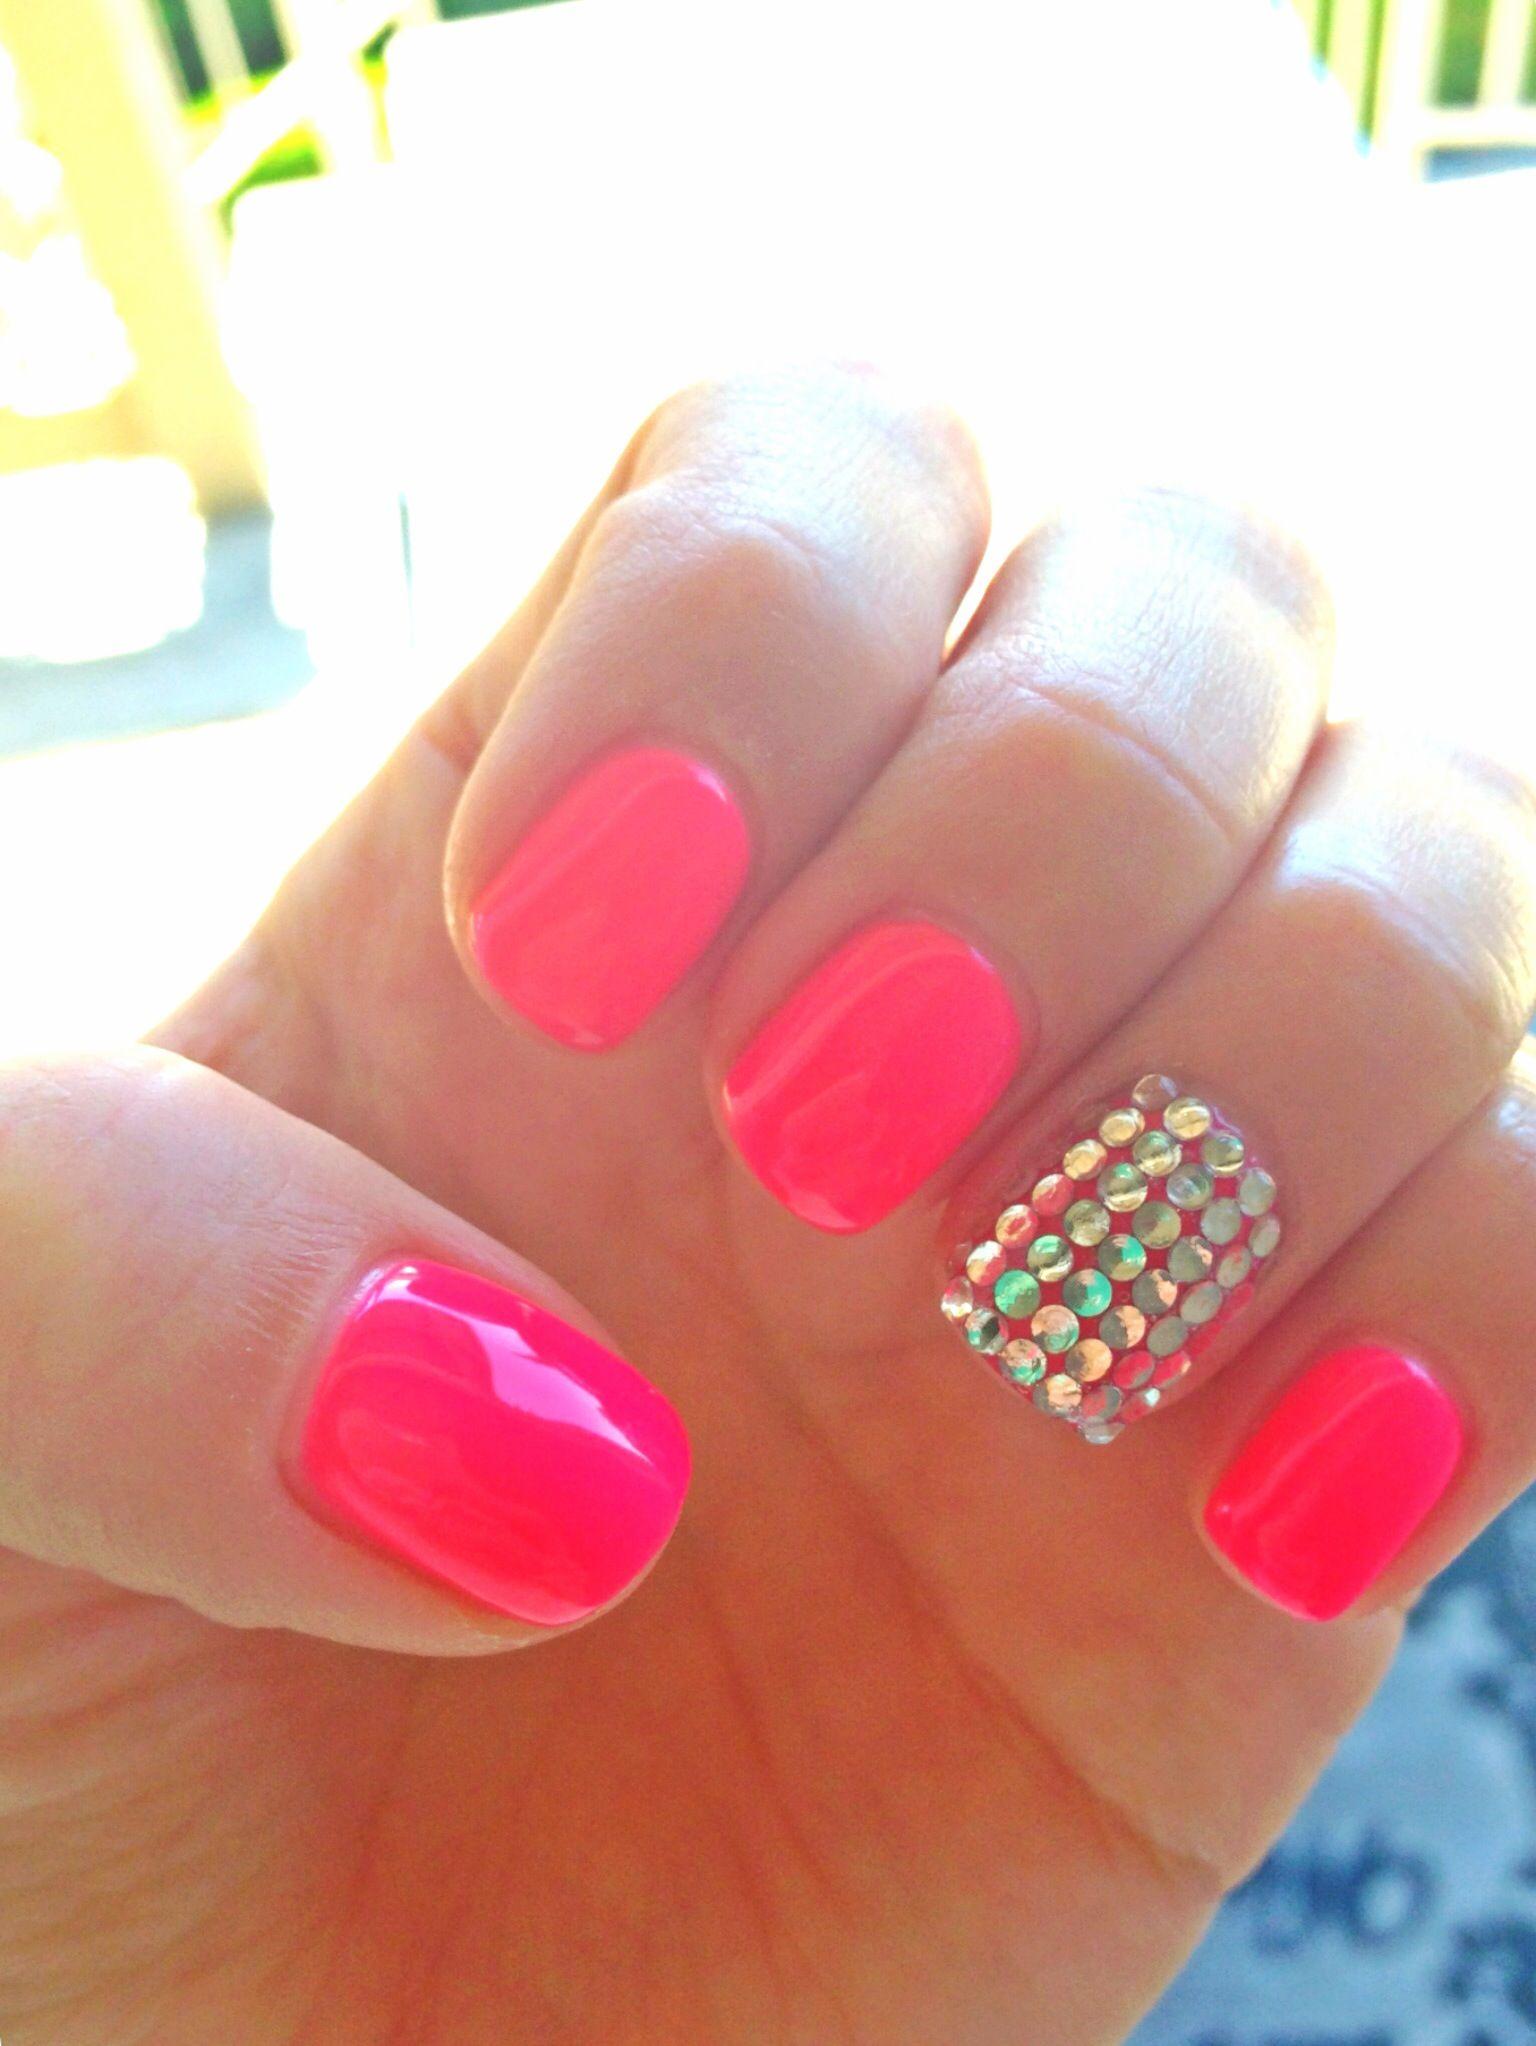 Pin By Dayna Anastacia On Nails Nails Nails Vegas Nails Pink Nails Pink Manicure